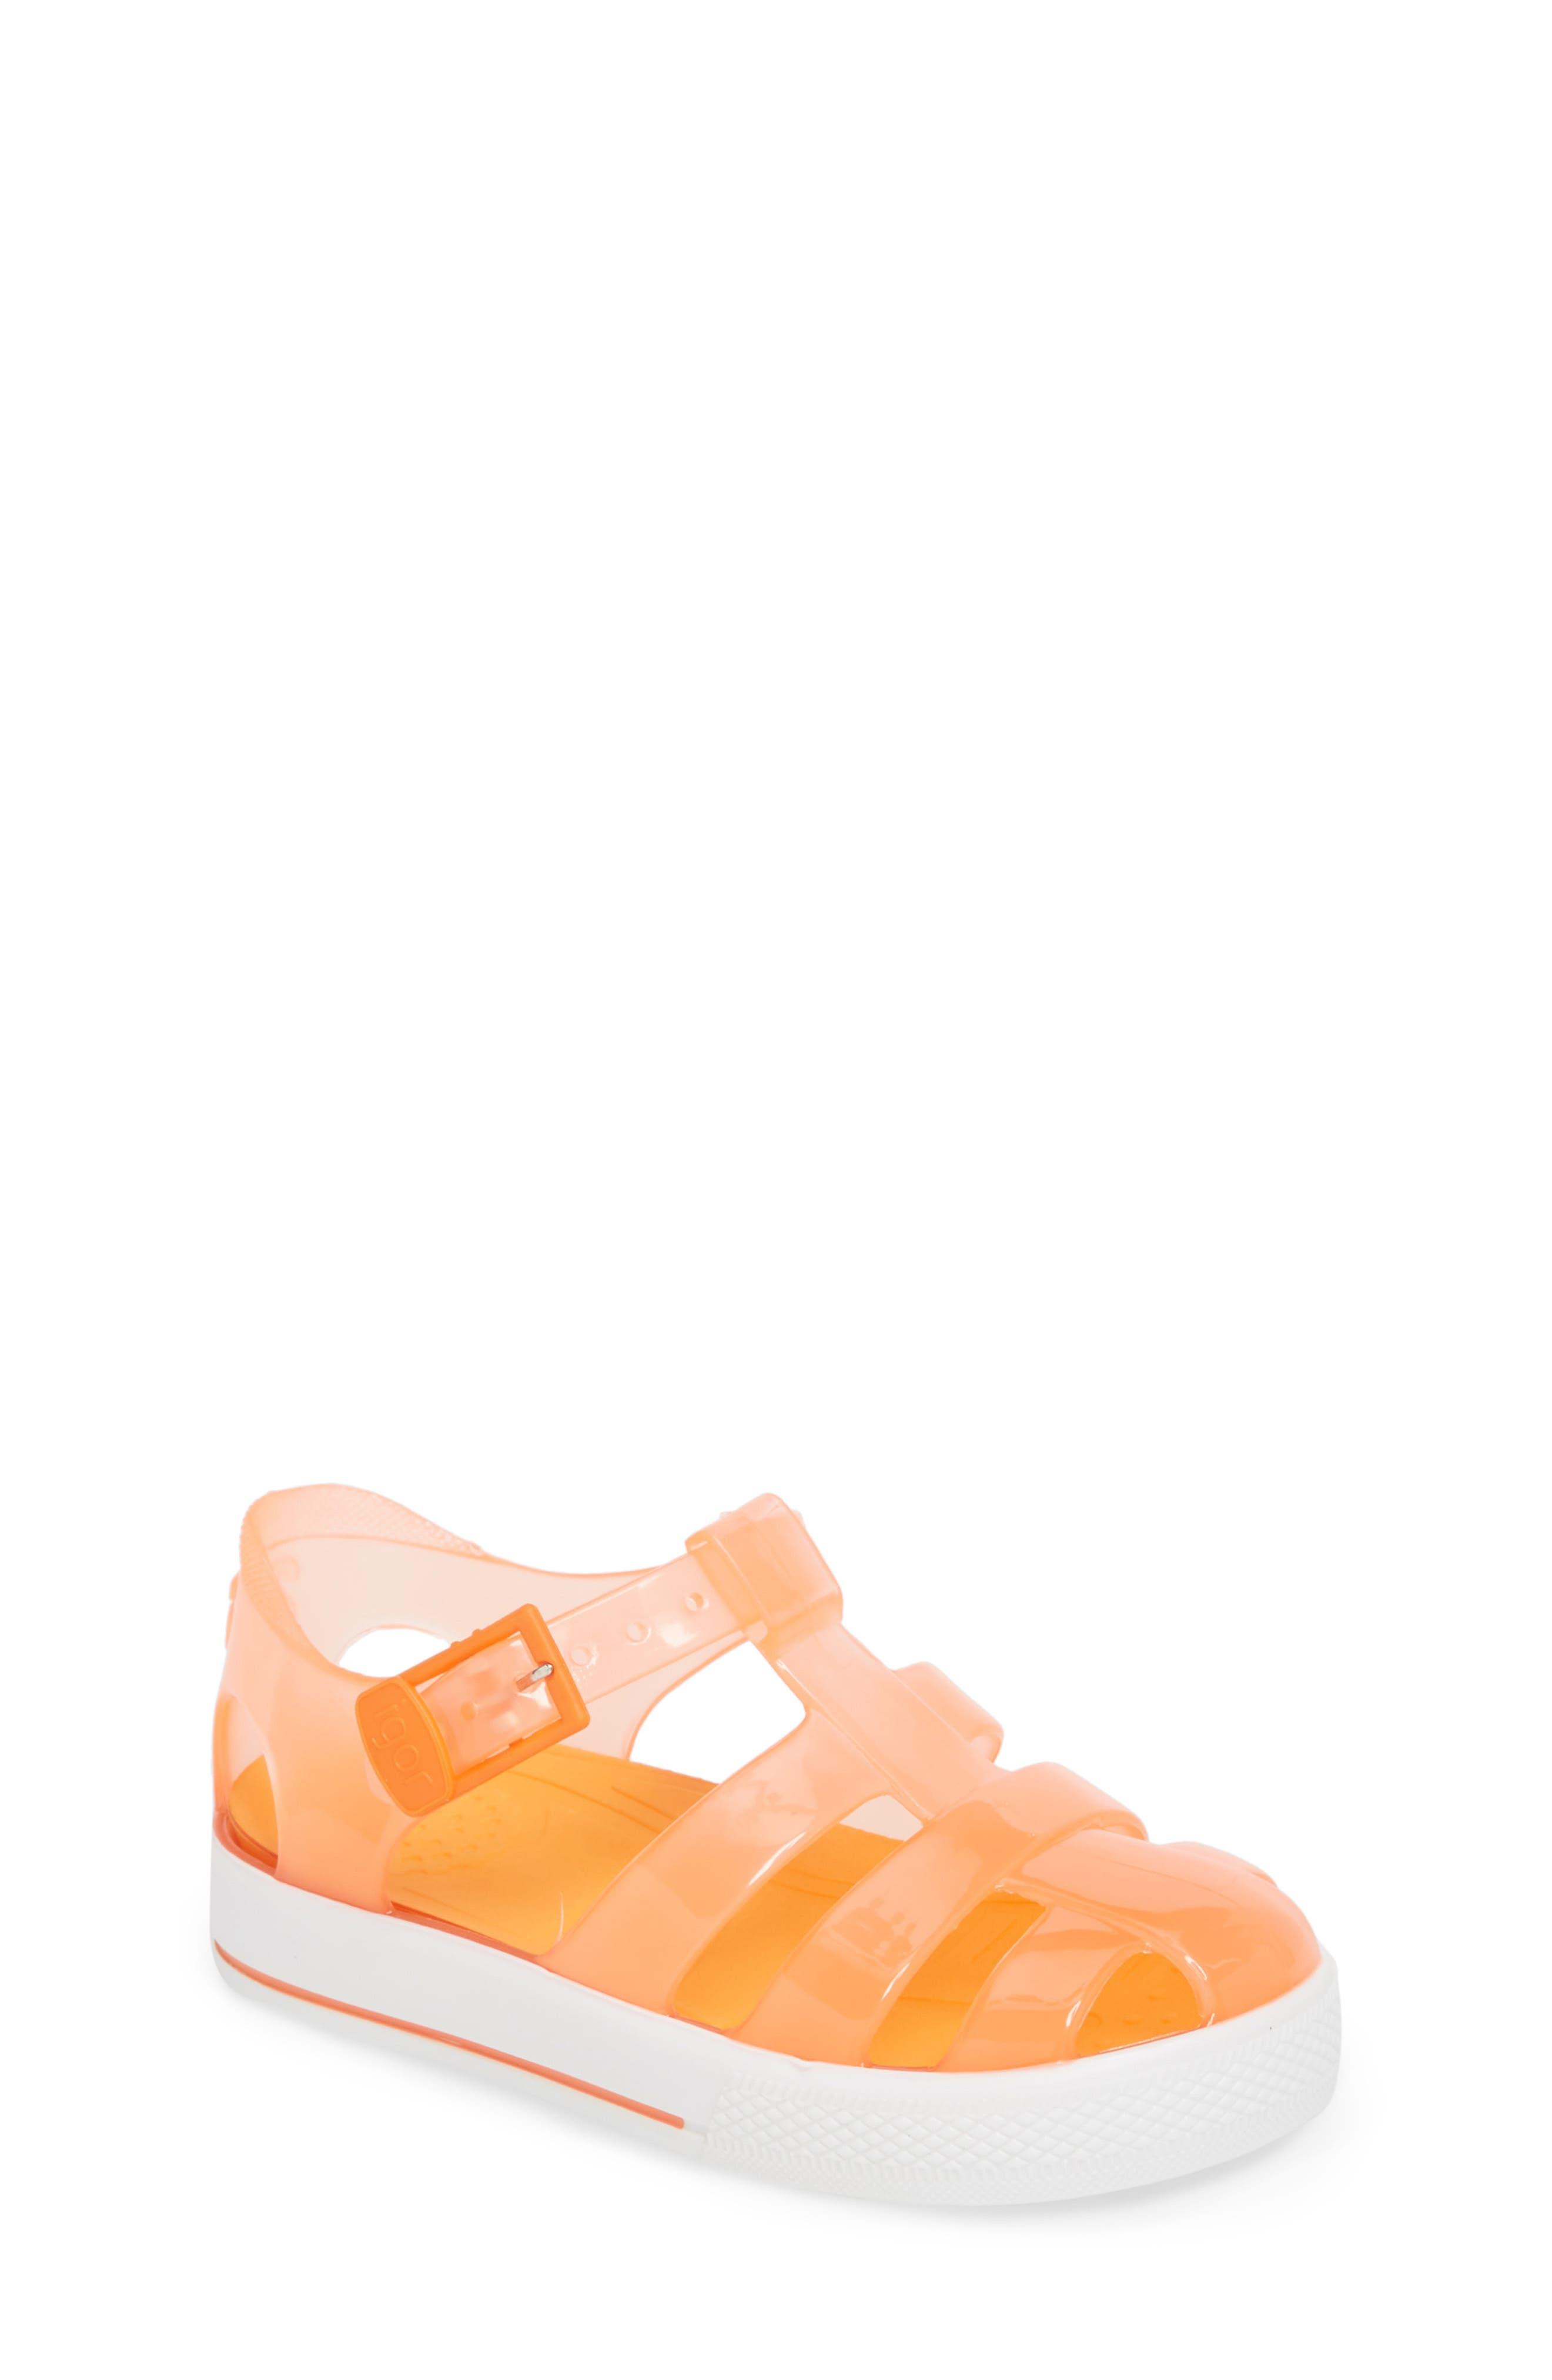 Tenis Fisherman Jelly Sandal,                             Main thumbnail 1, color,                             Crystal Neon Orange